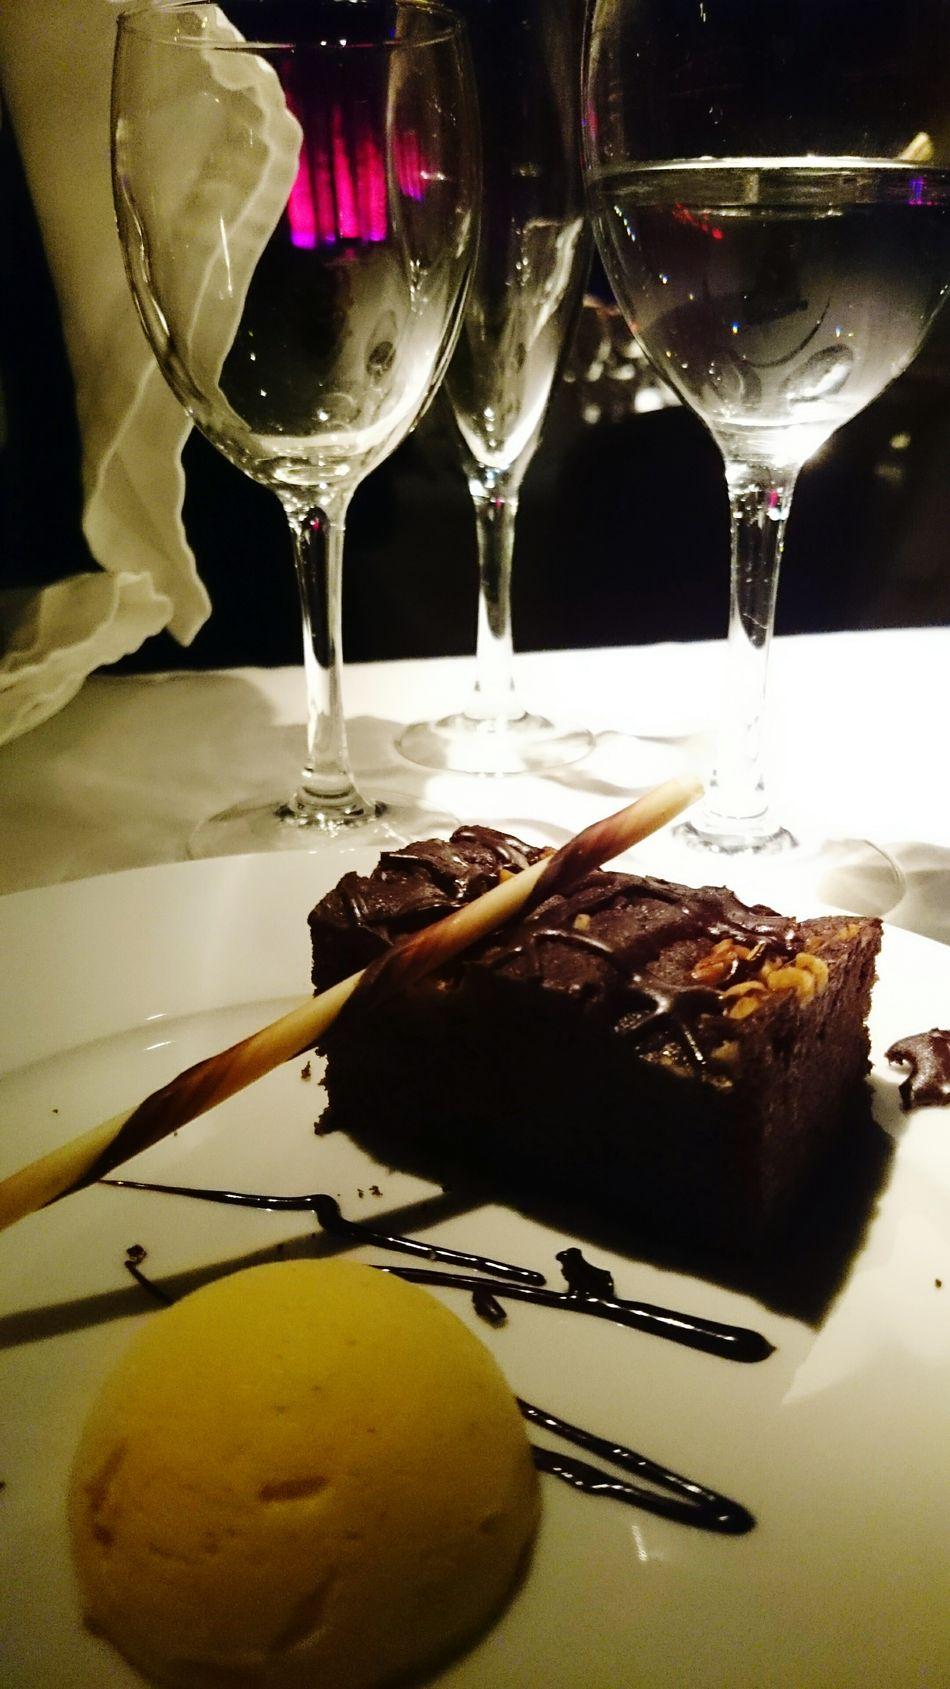 Foodporn Desert Beauty Brownie Chocolate Cake Ice Cream